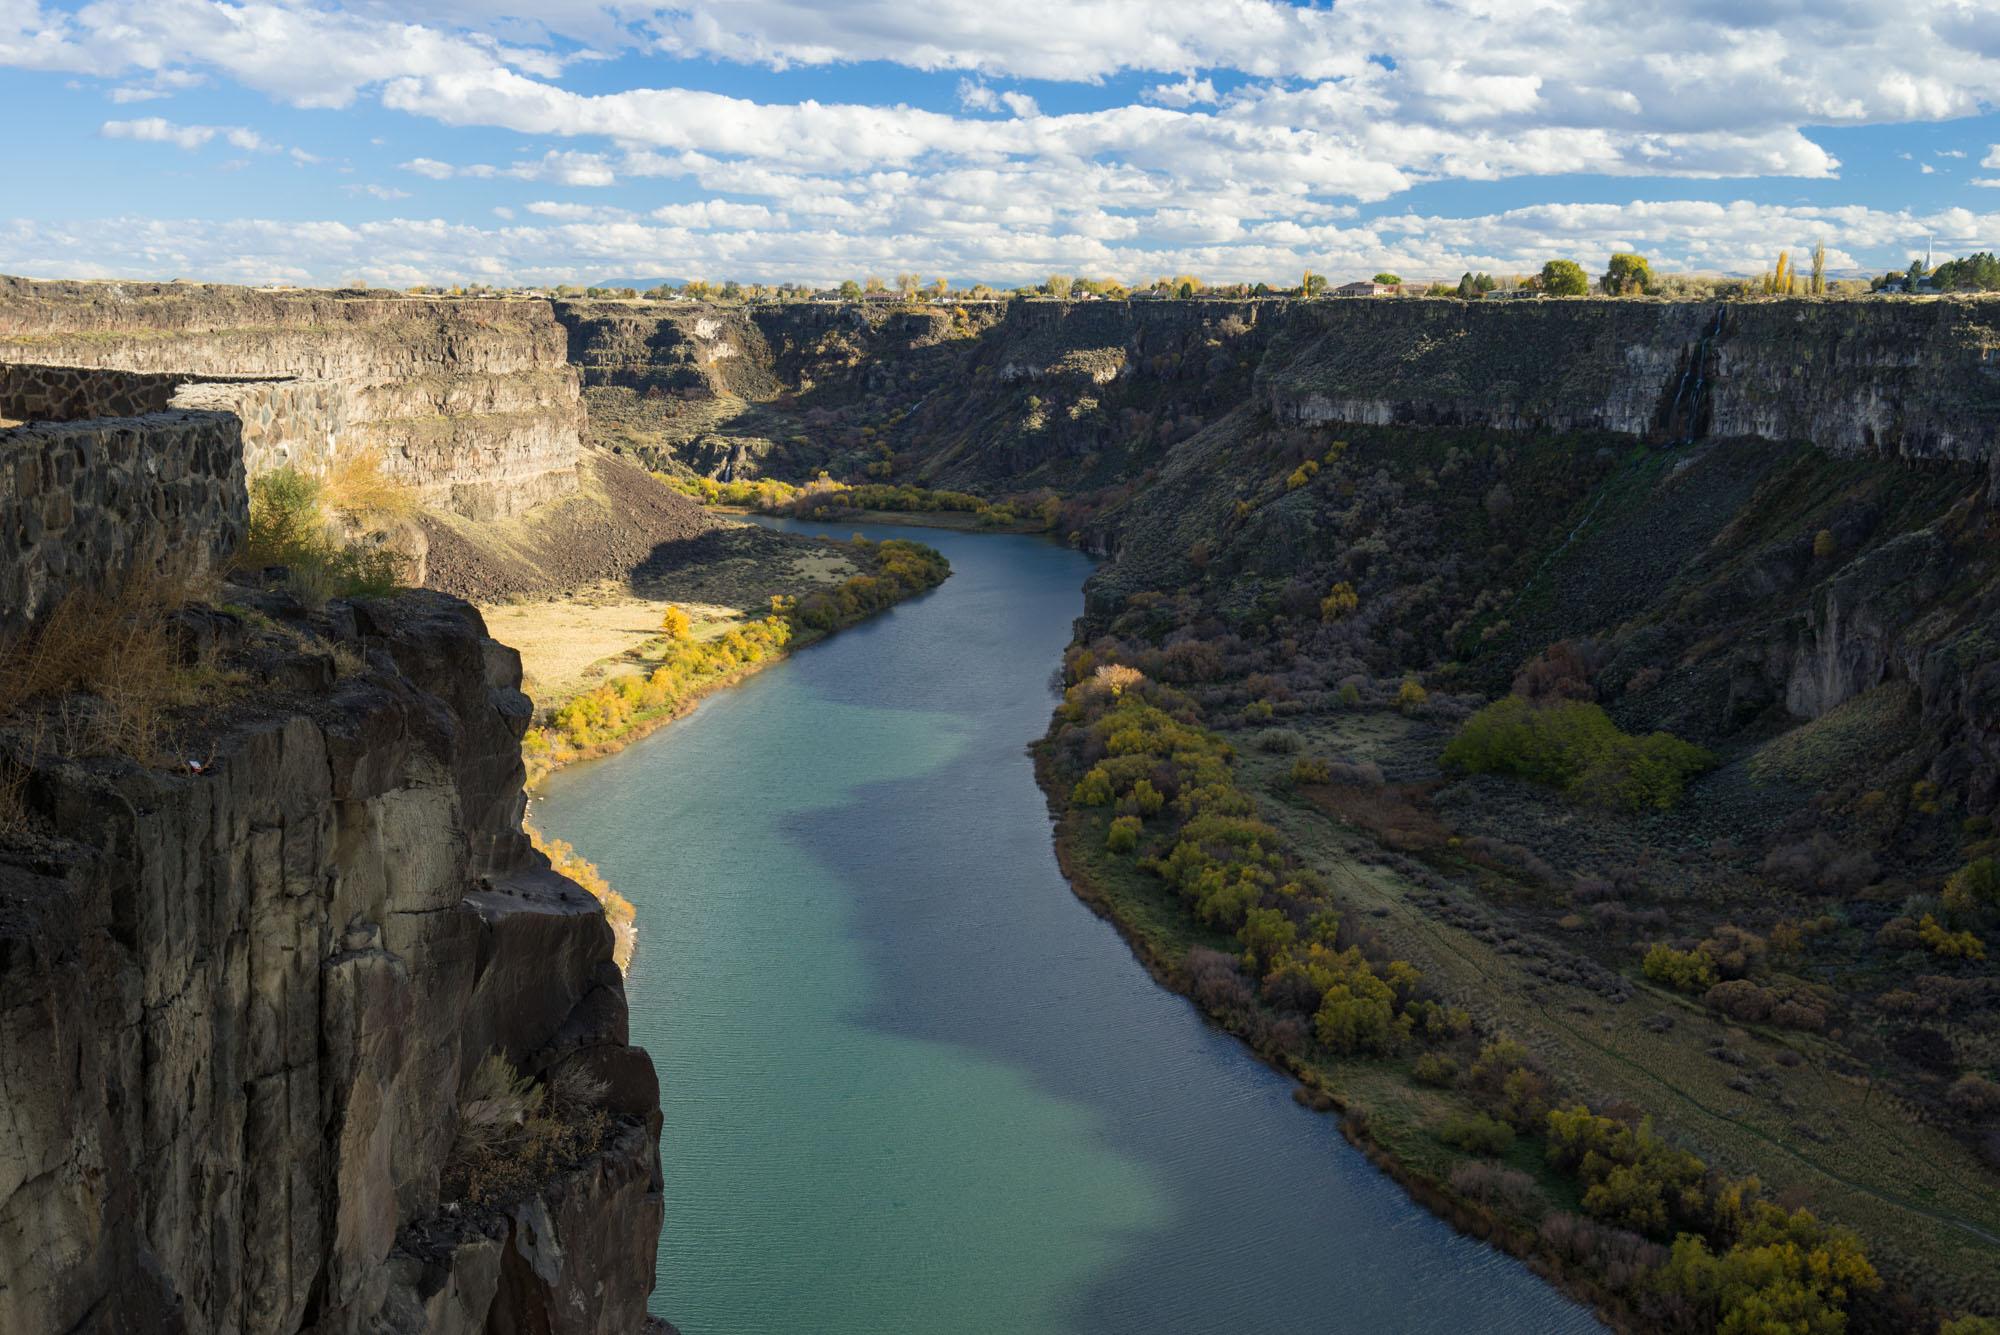 Snake River Overlook